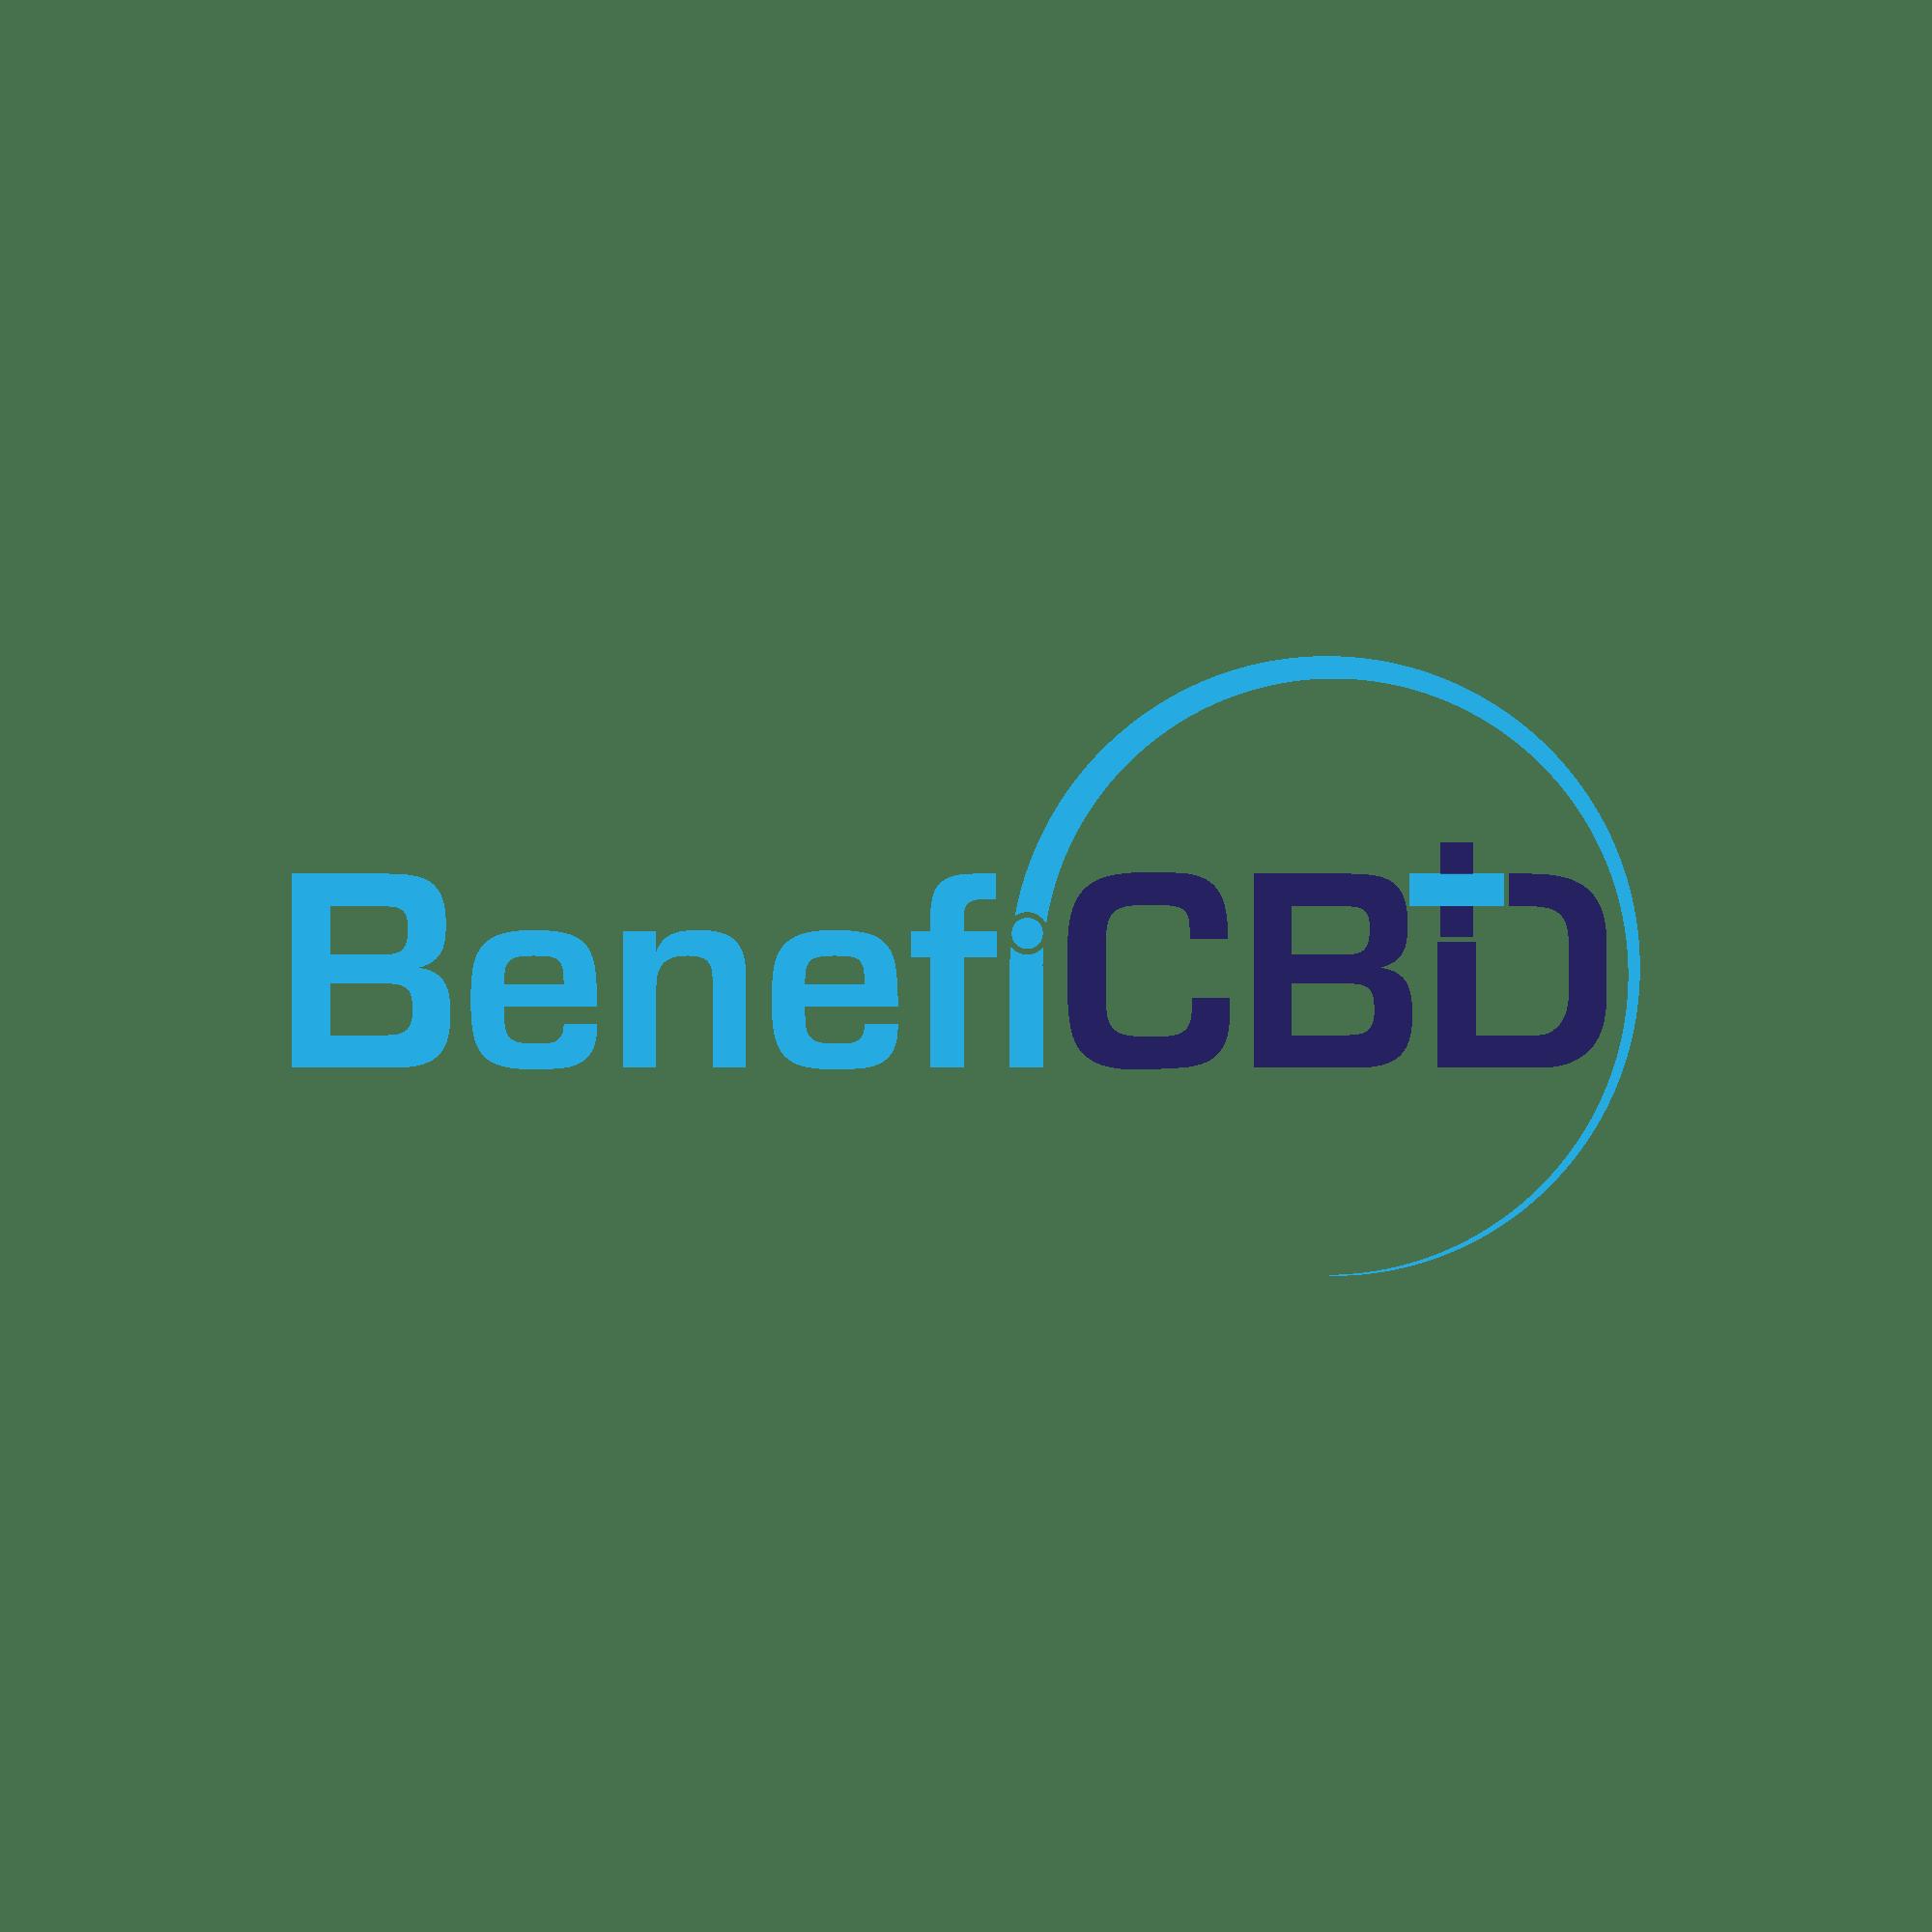 112_BenefiCBD_Logo_00-02